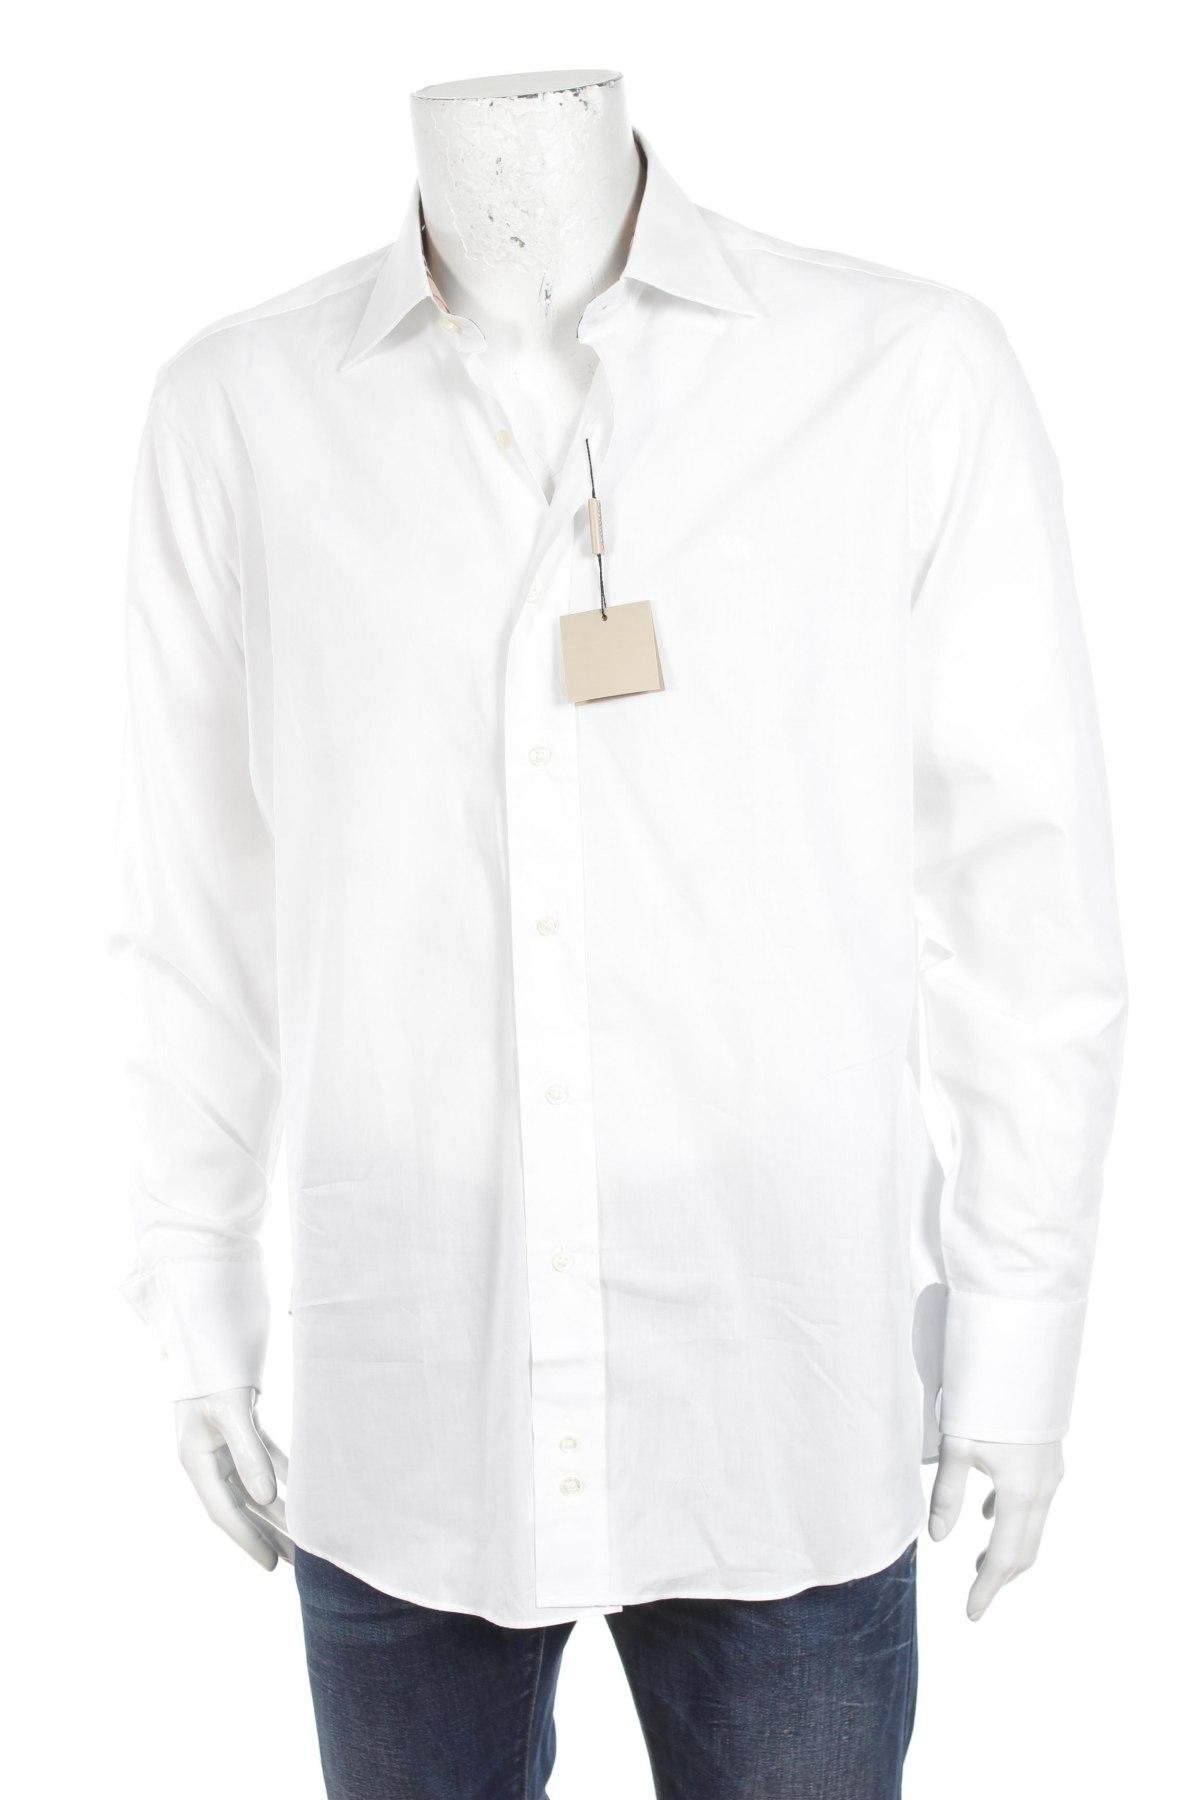 84c79de628 Ανδρικό πουκάμισο Burberry - σε συμφέρουσα τιμή στο Remix -  8802403